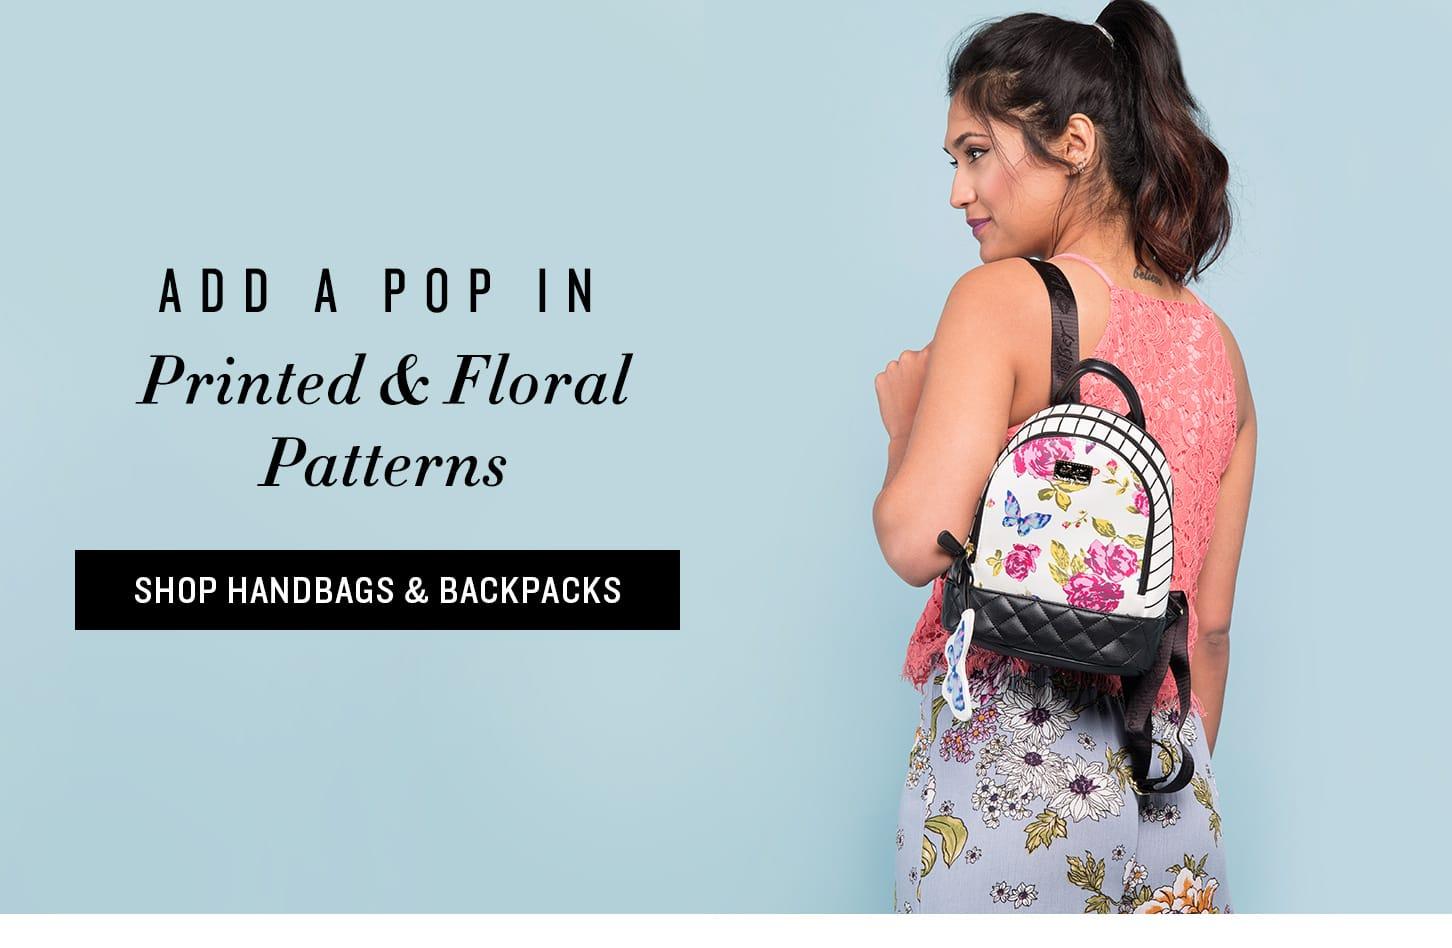 Shop Printed & Floral Bags